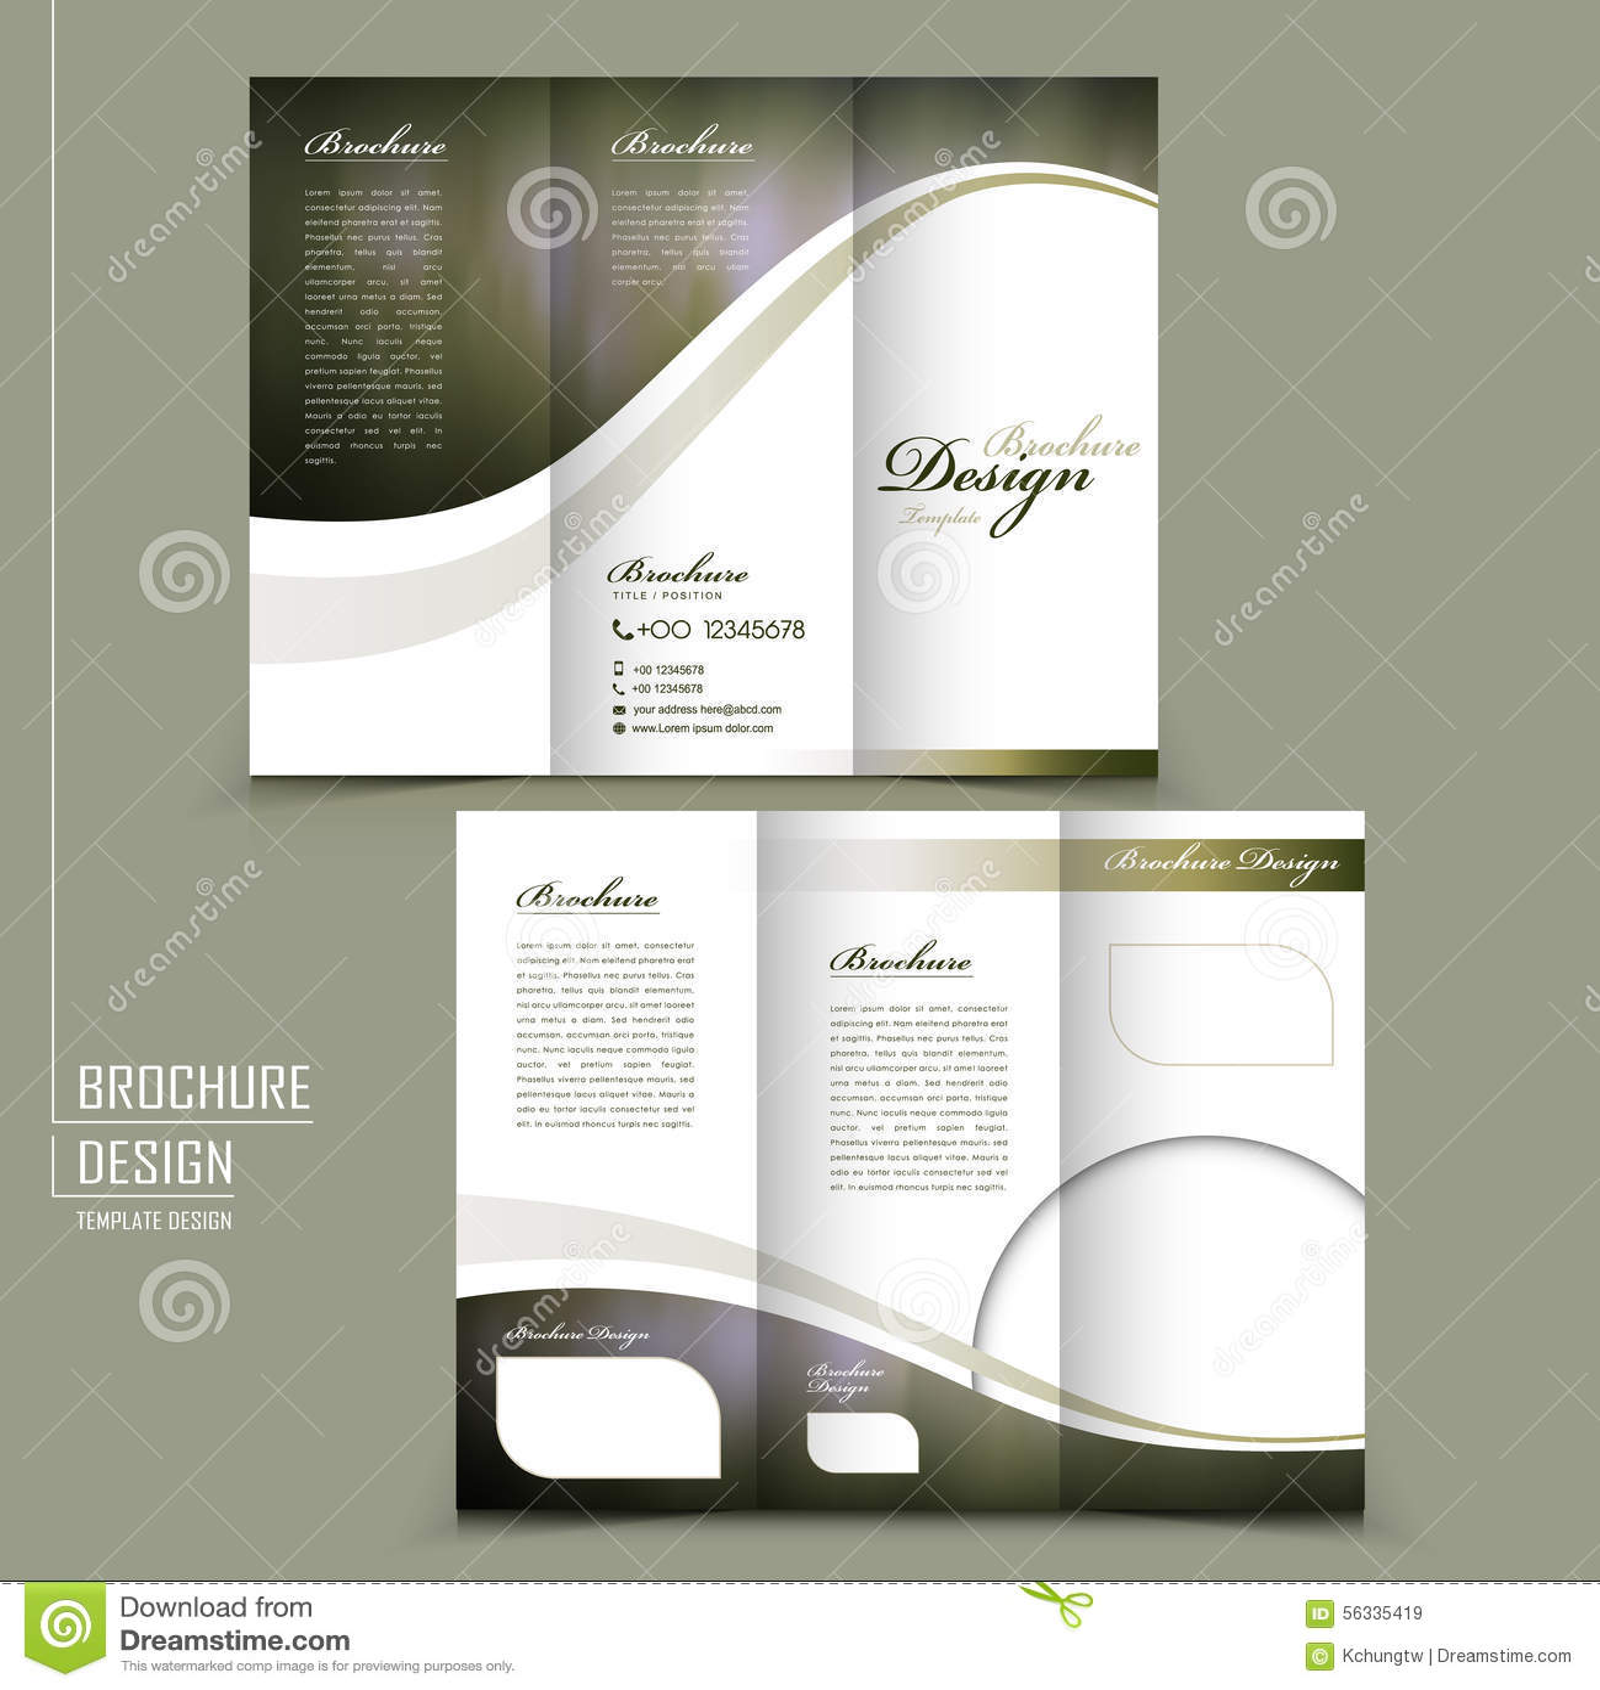 elegant brochure template - graceful tri fold brochure template design stock vector